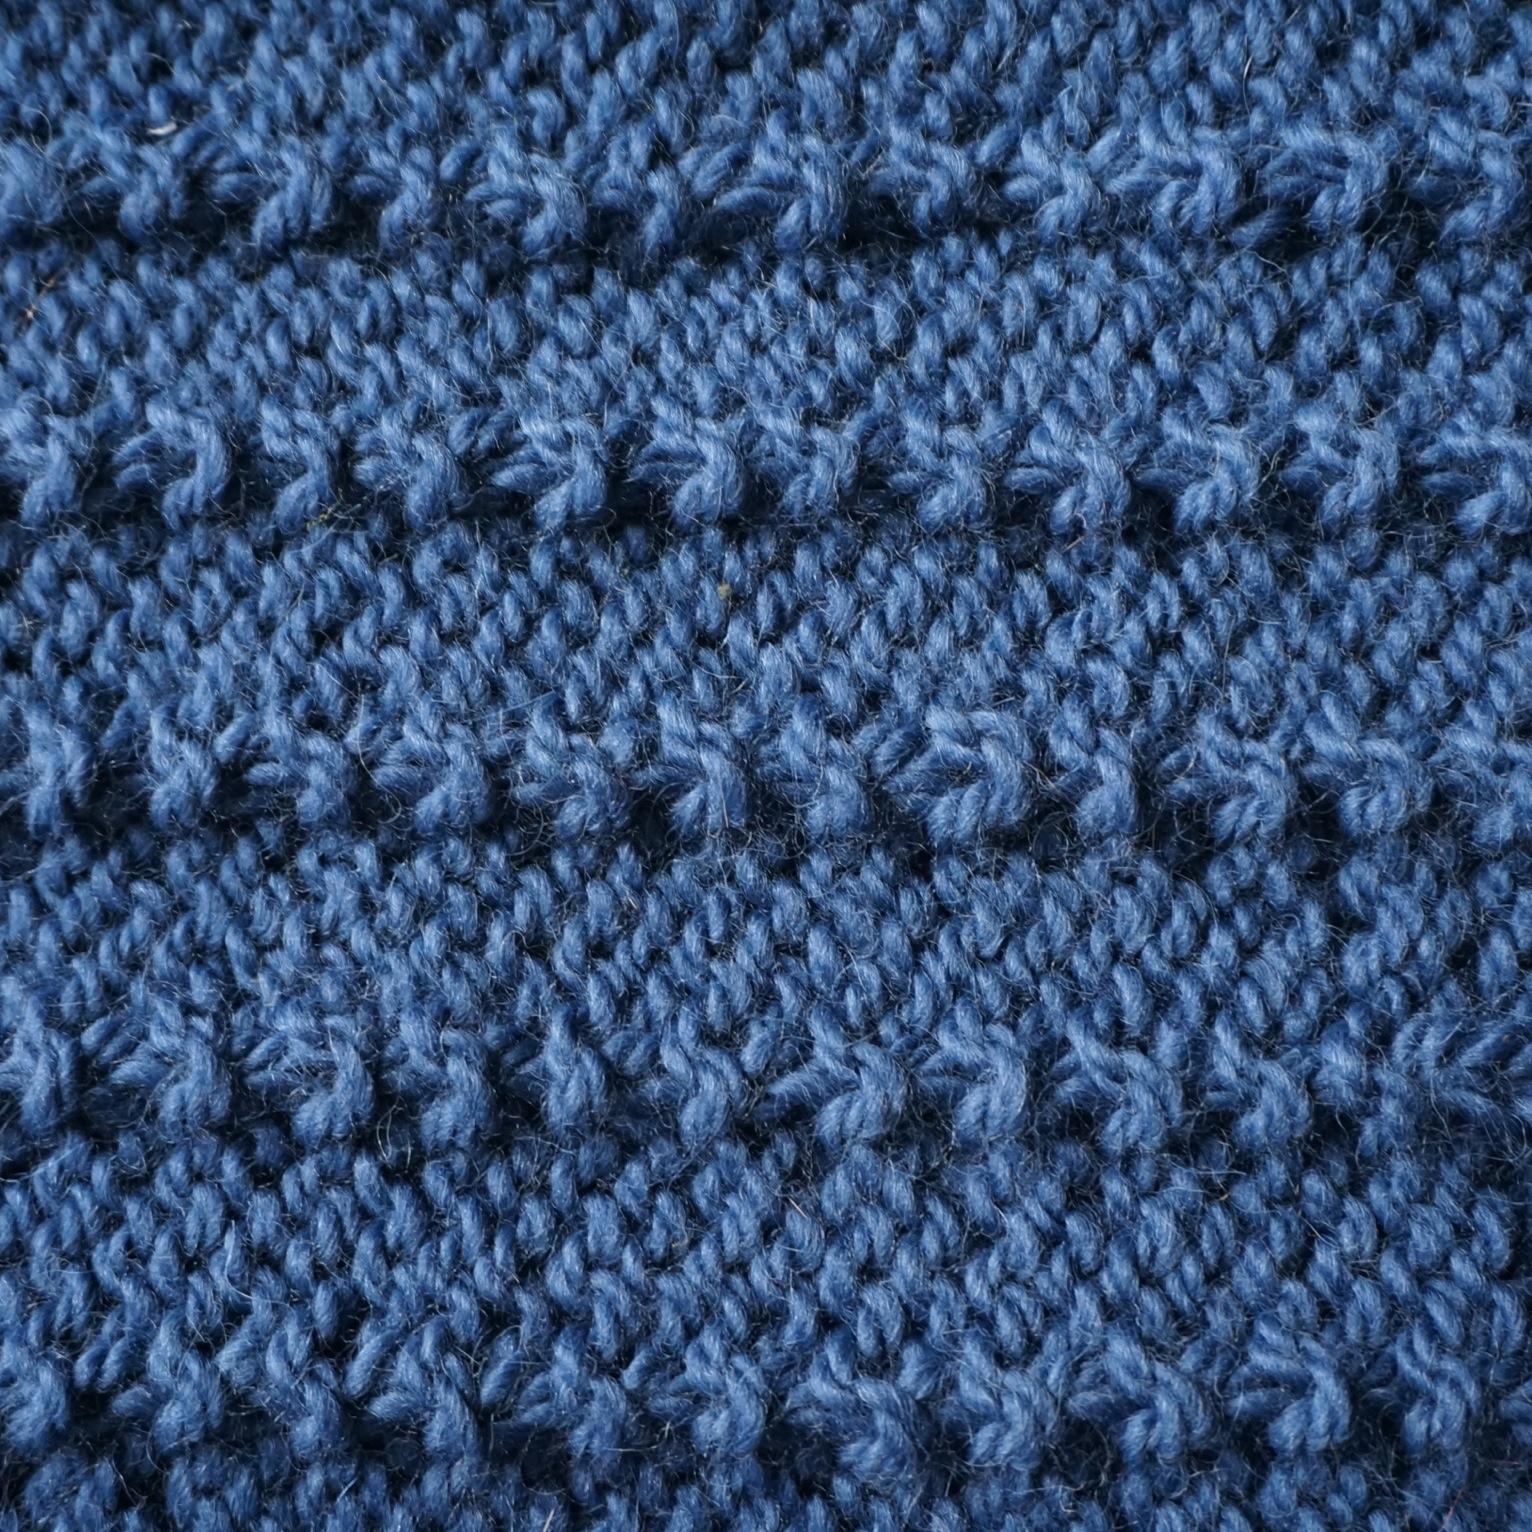 b30c460d7be3f Point fantaisie pour echarpe - i love tricot